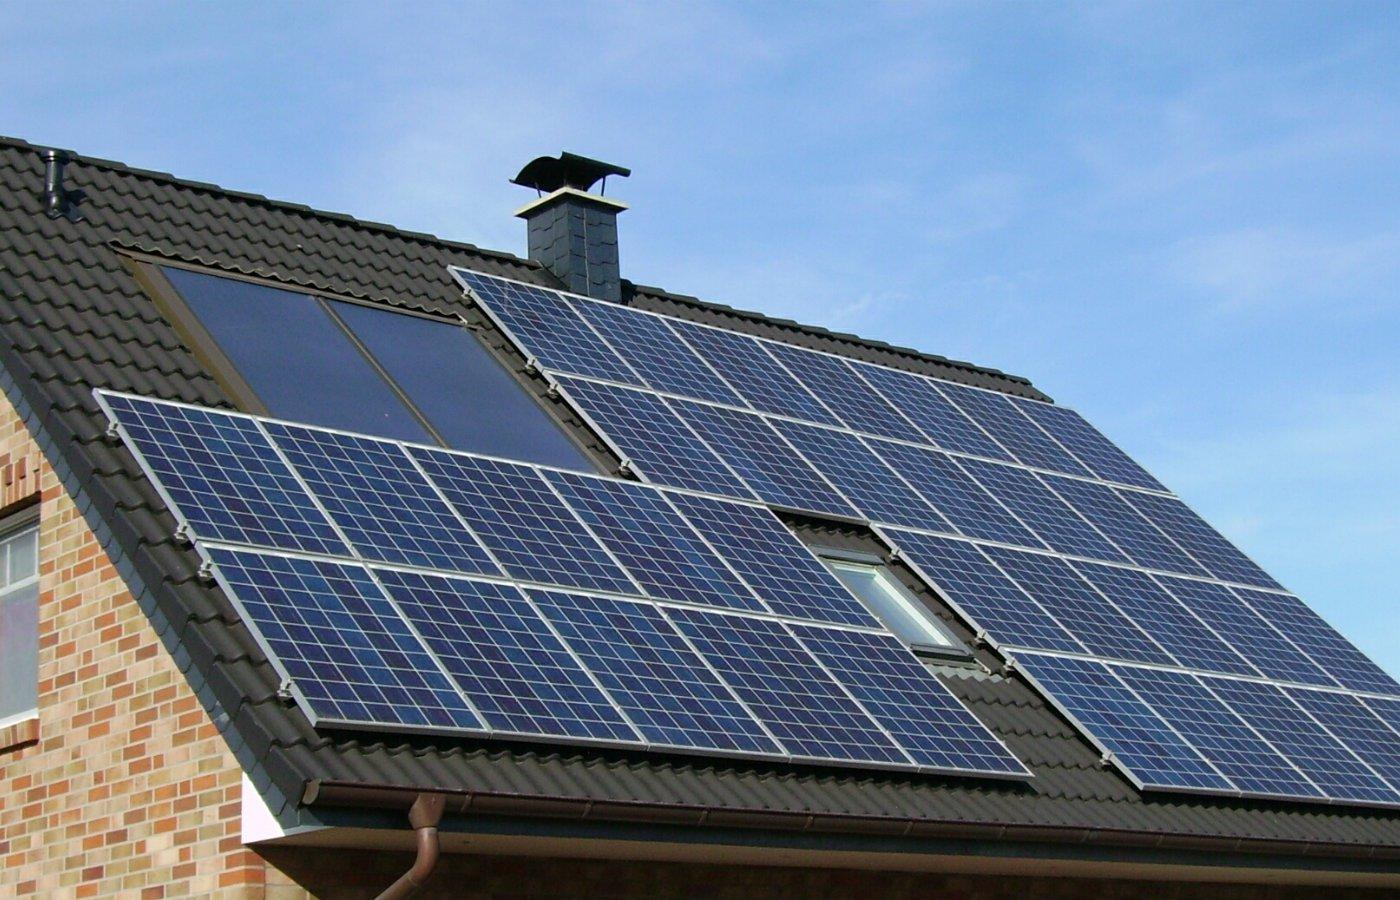 solar panels advantages disadvantages.jpg